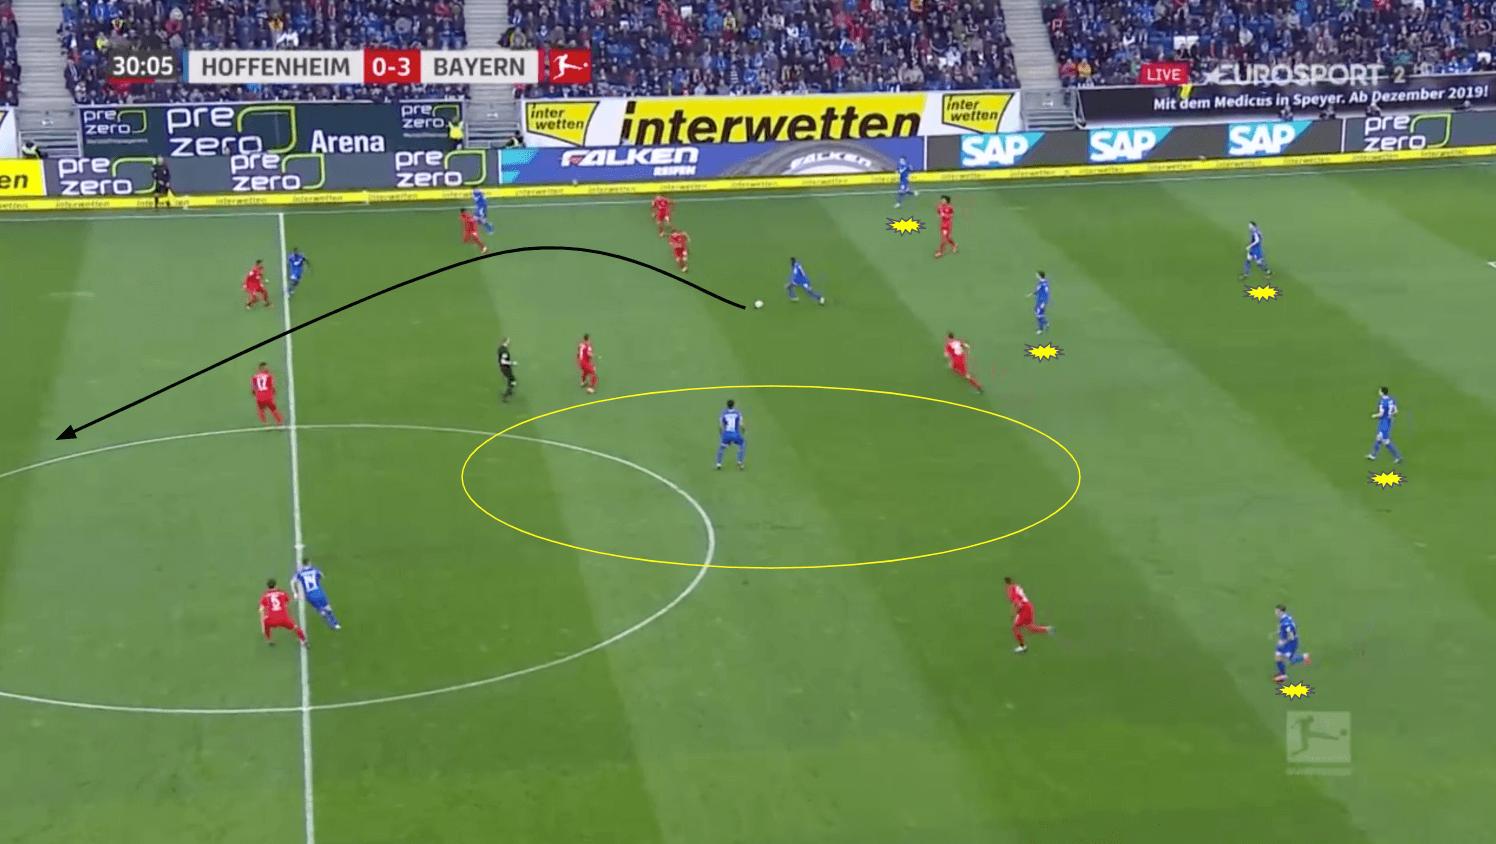 Bundesliga 19/20: Bayern Munich vs Hoffenheim - tactical analysis tactics